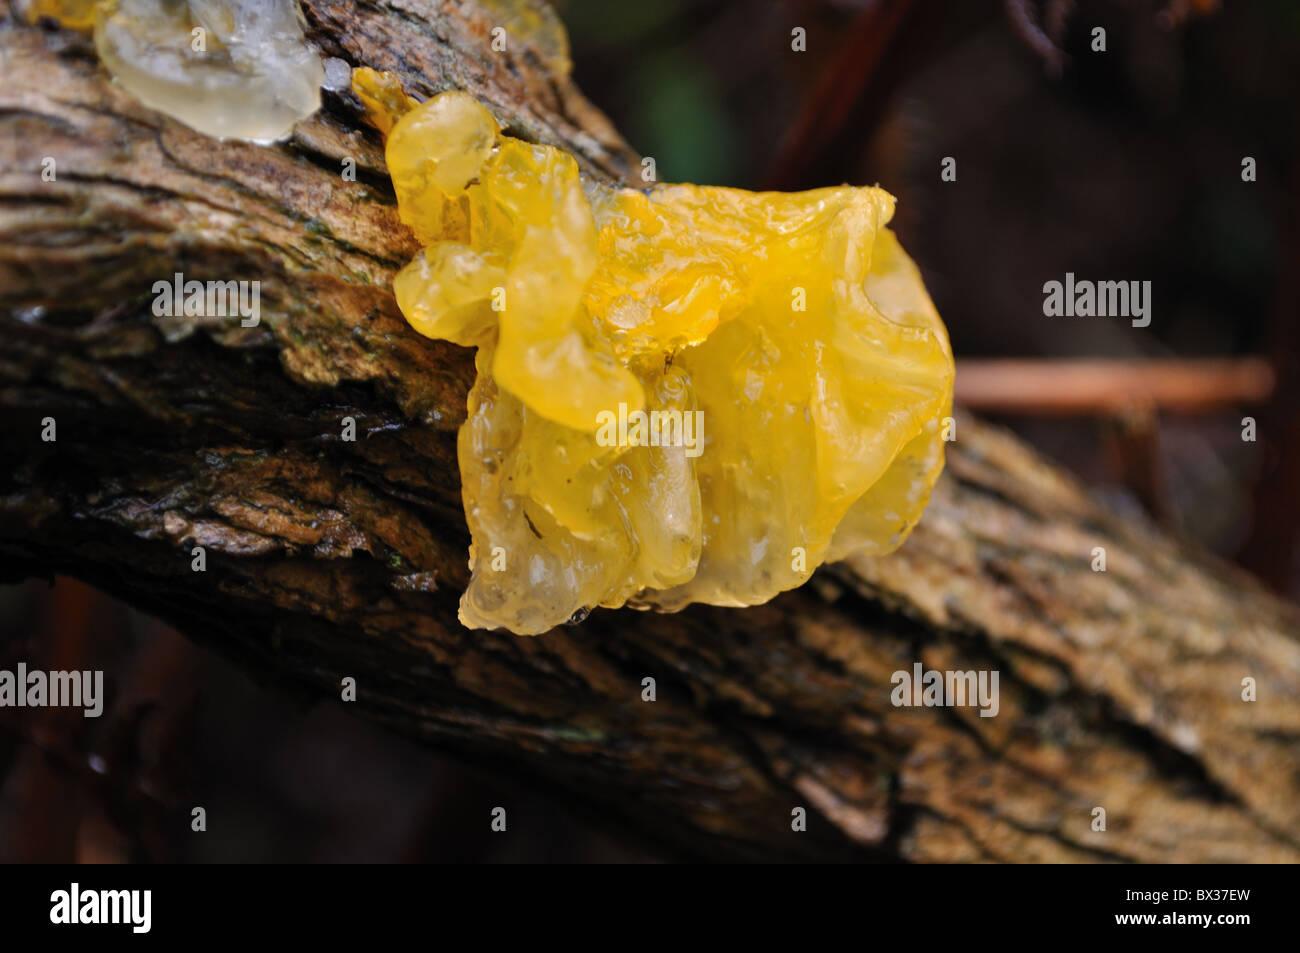 yellow fungi stockfotos yellow fungi bilder alamy. Black Bedroom Furniture Sets. Home Design Ideas